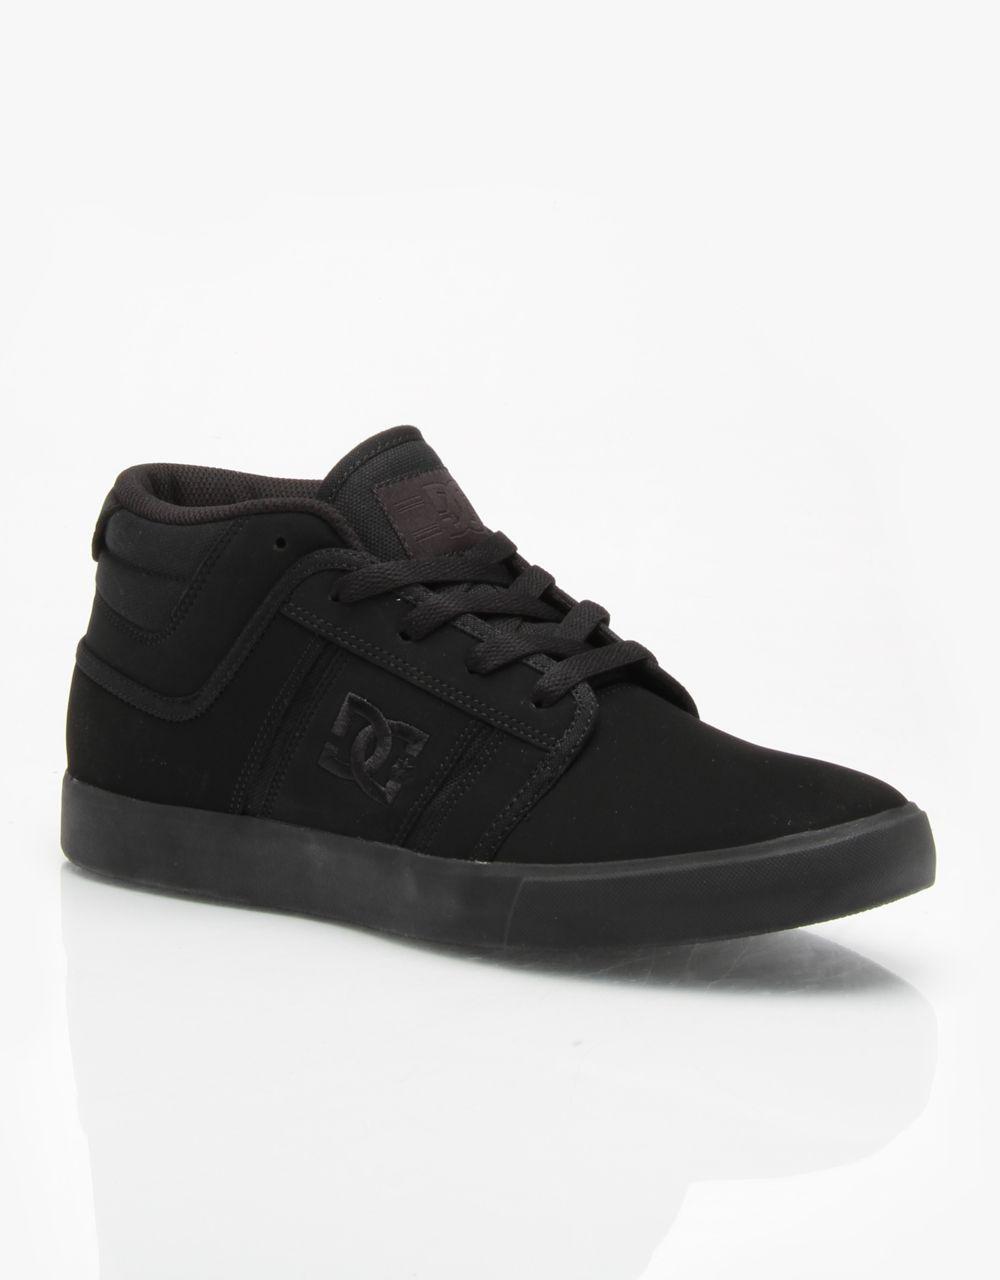 DC RD Grand Mid Skate Shoes - Black